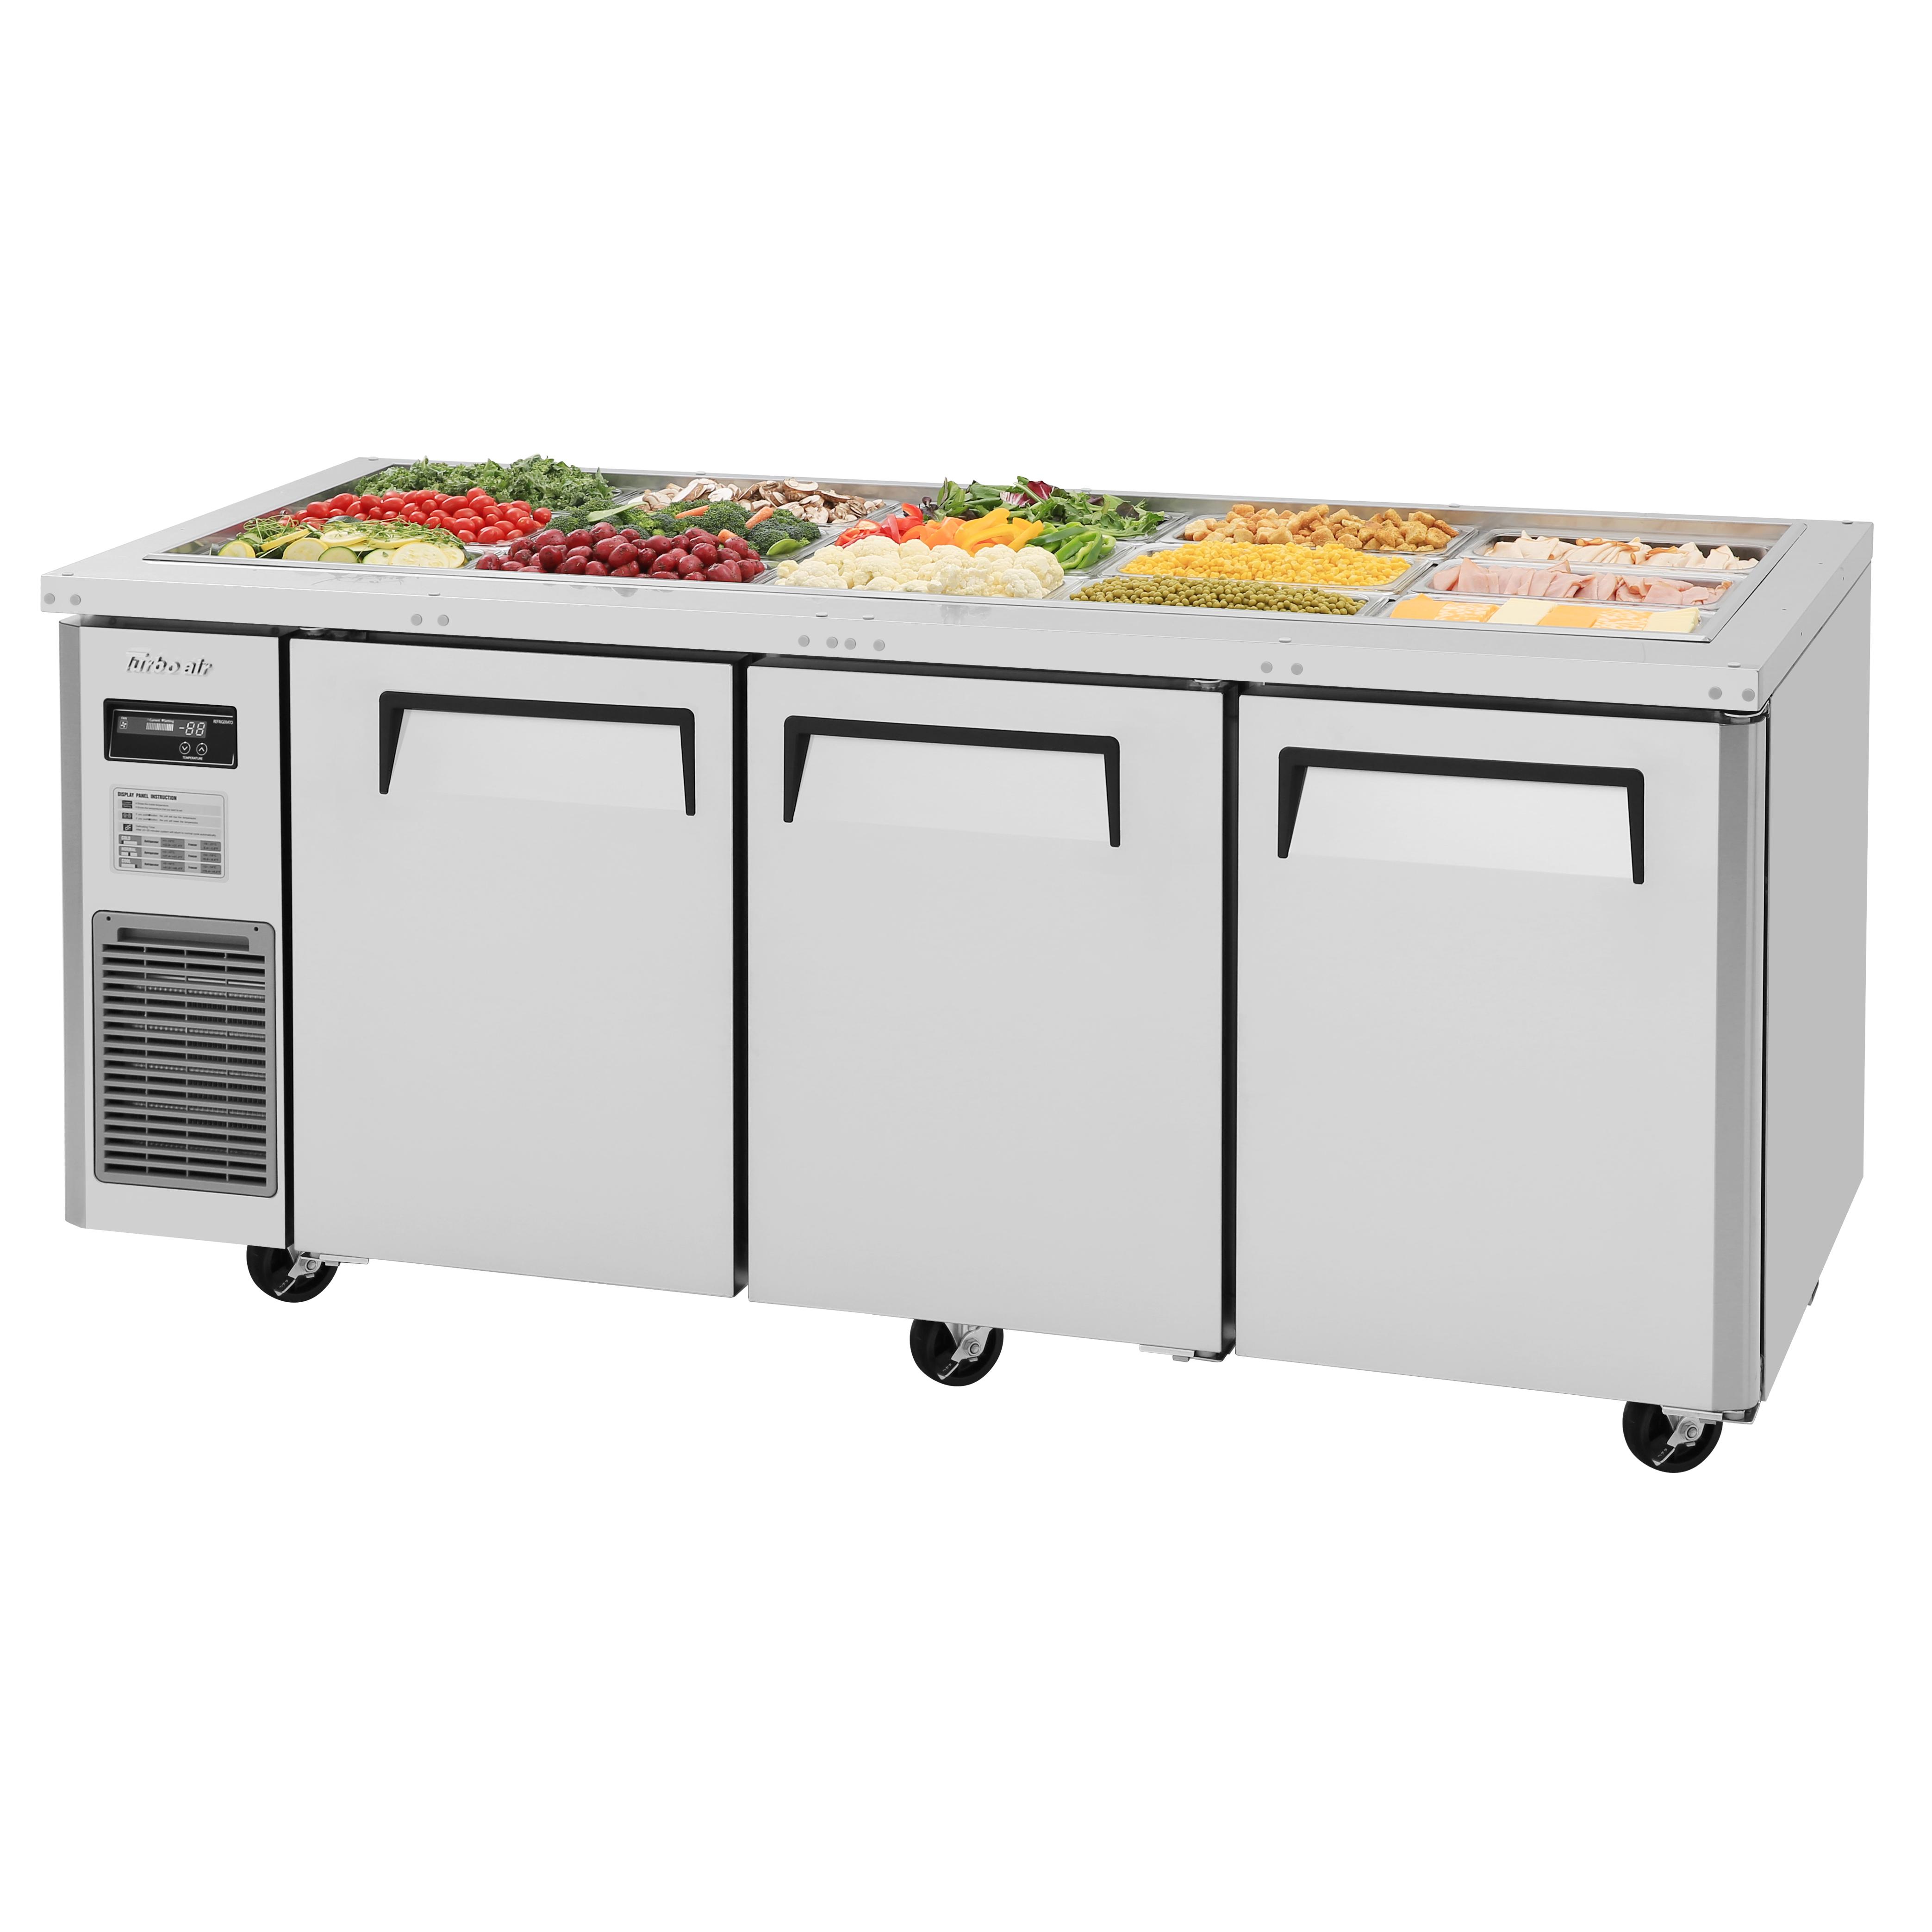 Turbo Air JBT-72-N refrigerated counter, sandwich / salad unit